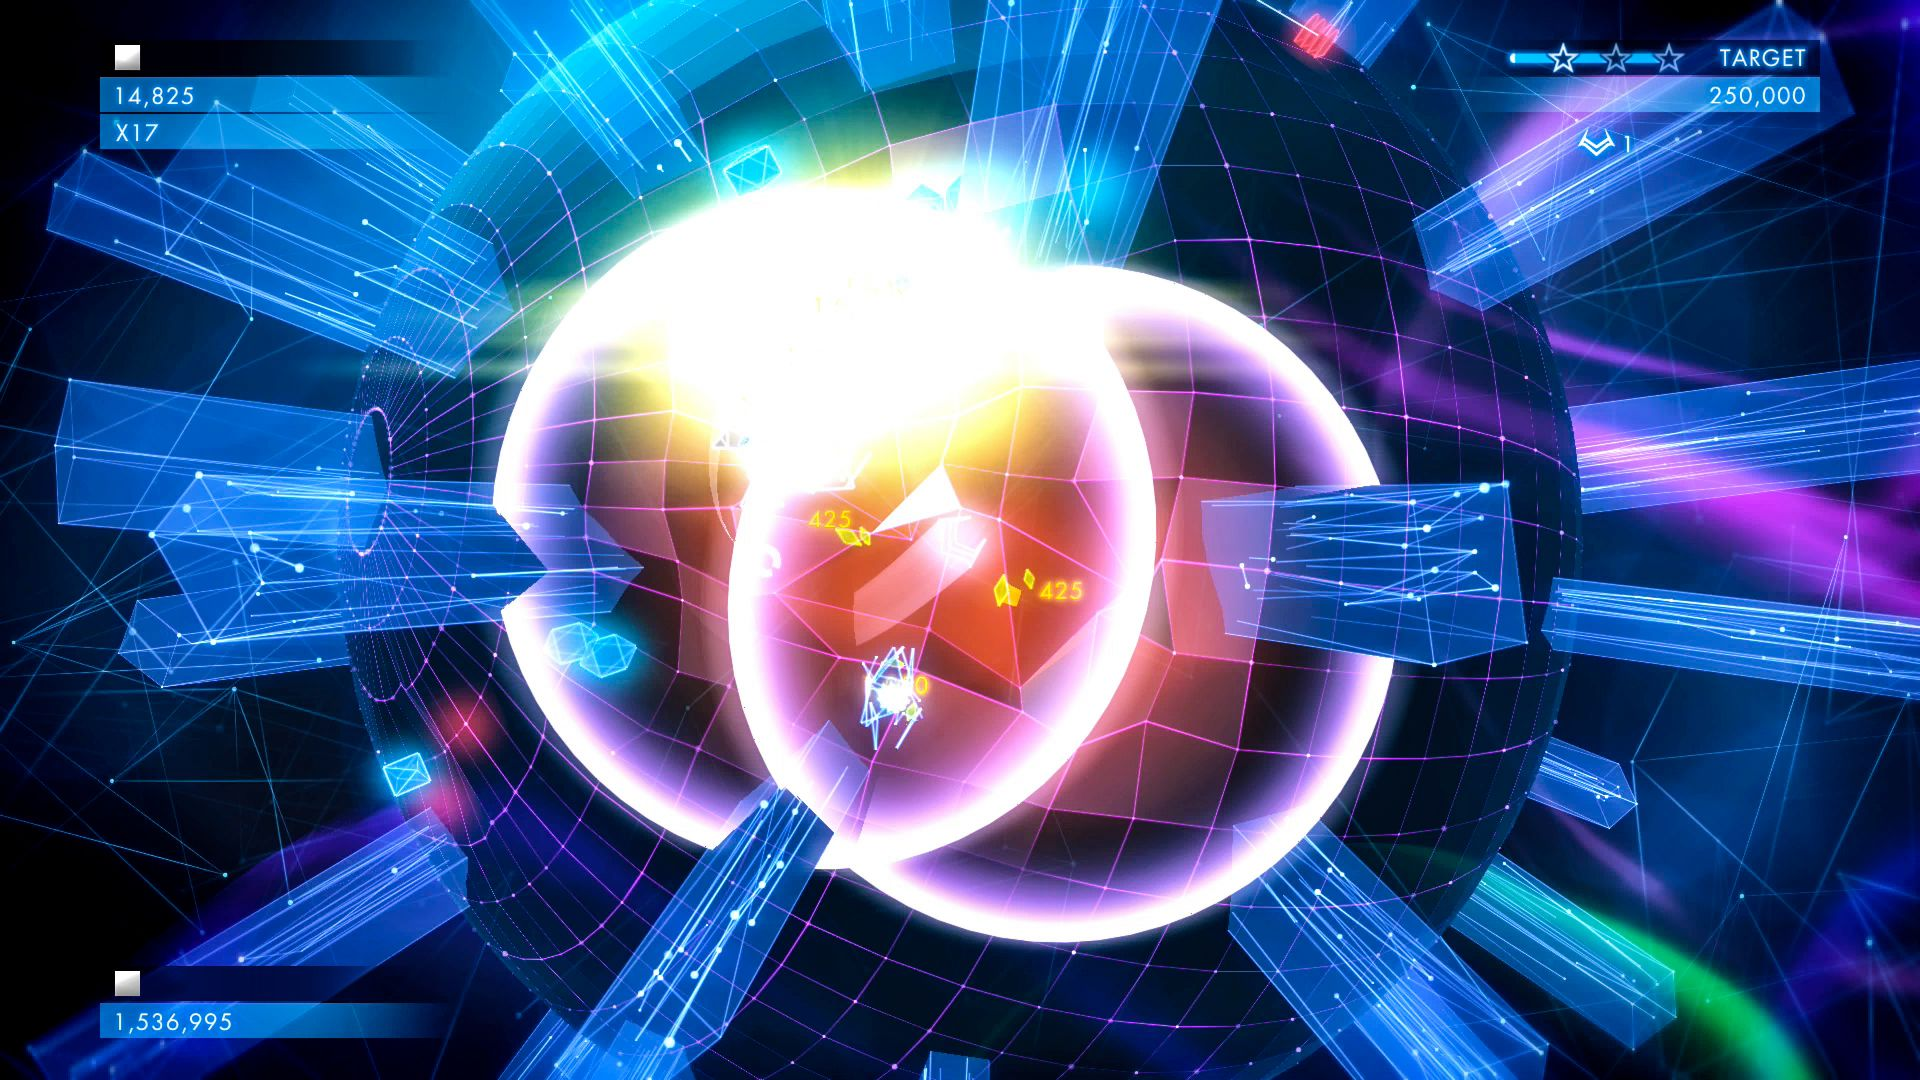 geometry-wars-3-ps-vita-screenshot-1